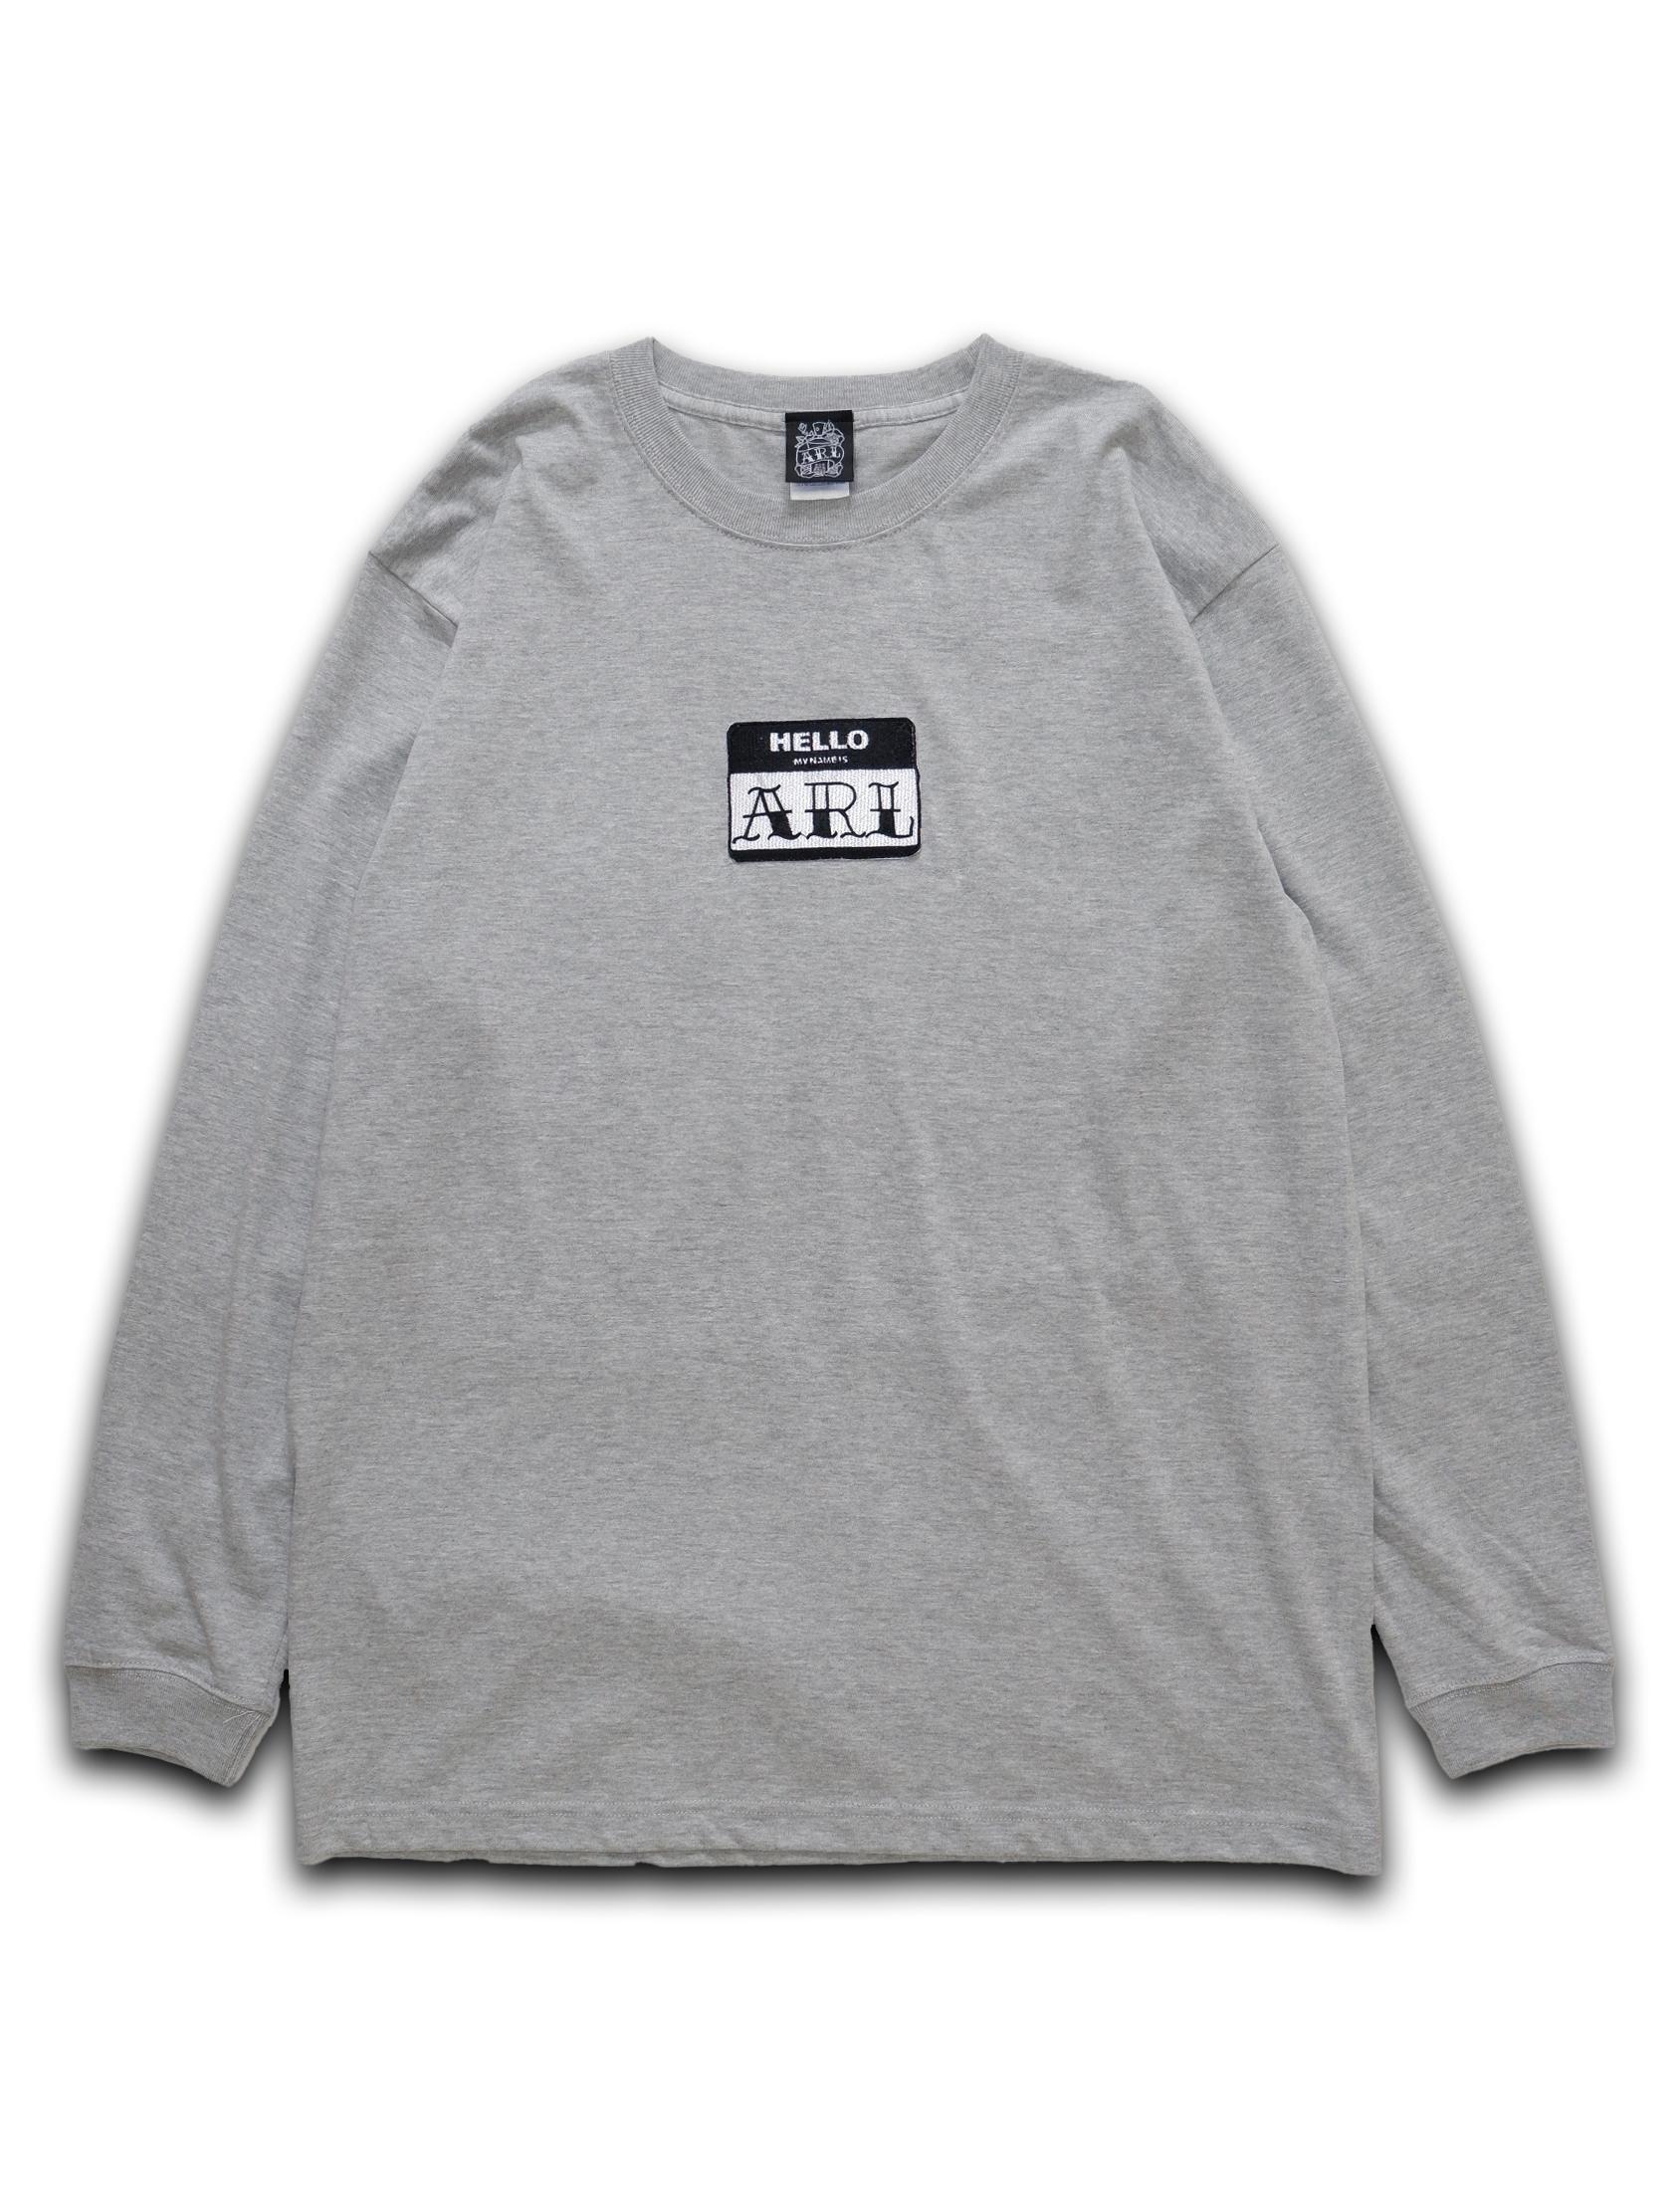 LOGO PATCH L/STEE gray